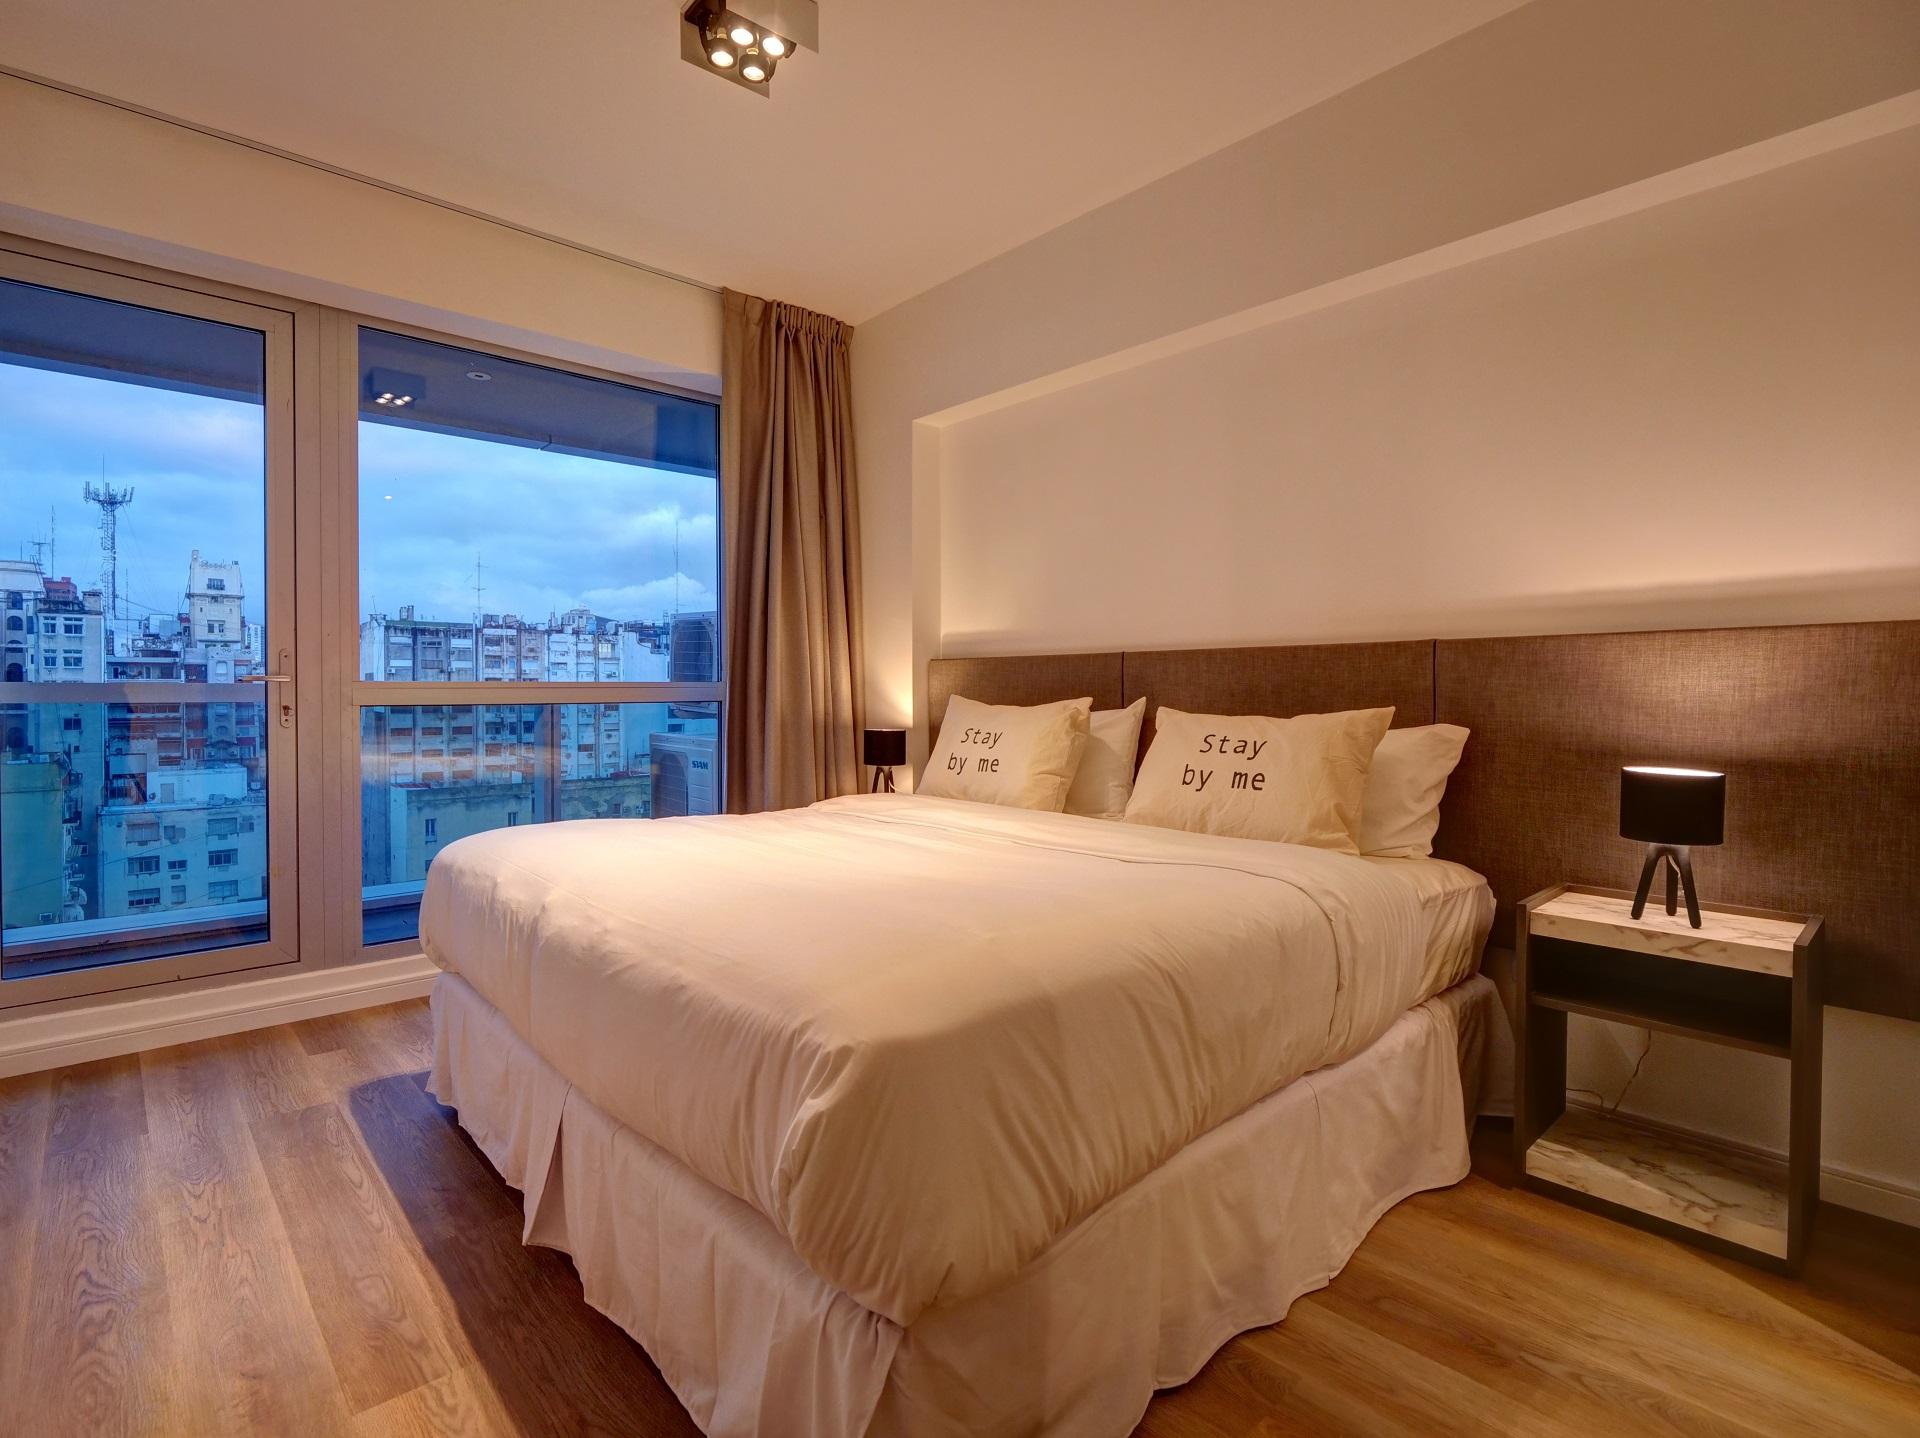 Bedroom at Bellini Esmeralda Apartments